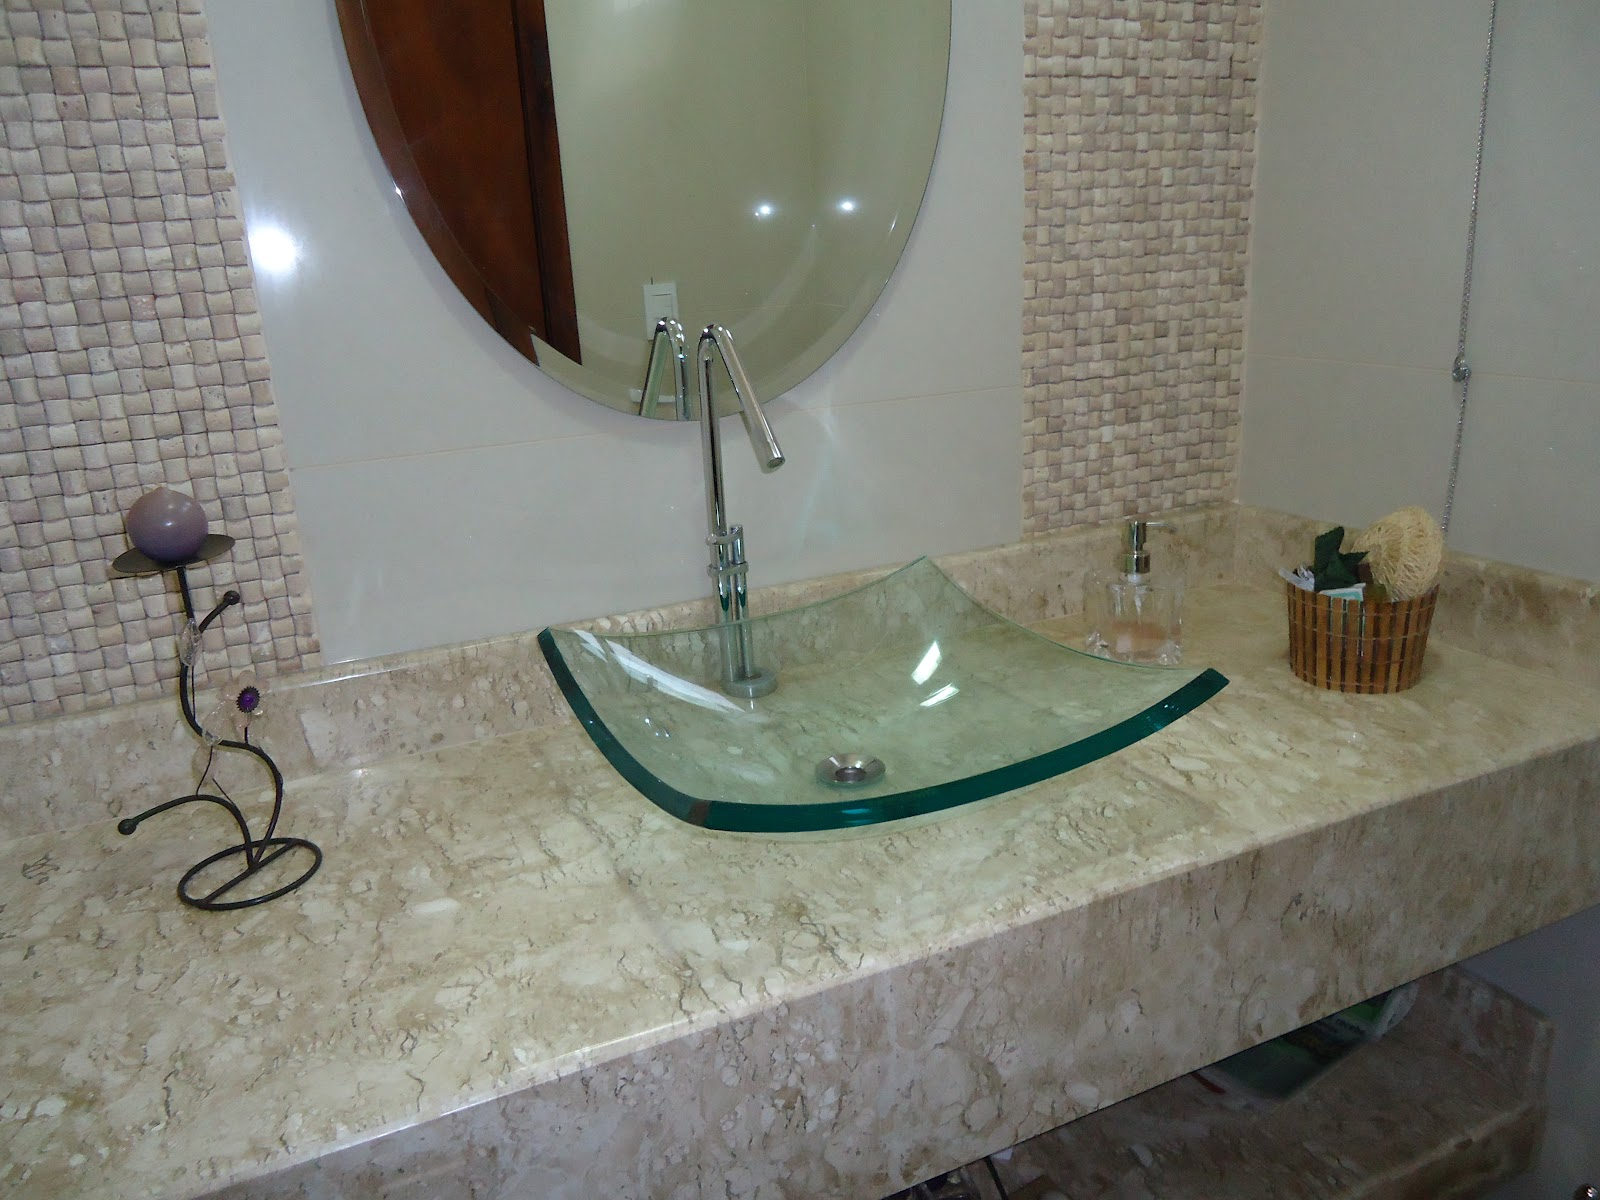 Decorar e Adorar : BANCADAS DE BANHEIRO #5A4E3C 1600x1200 Bancada Banheiro Marmore Travertino